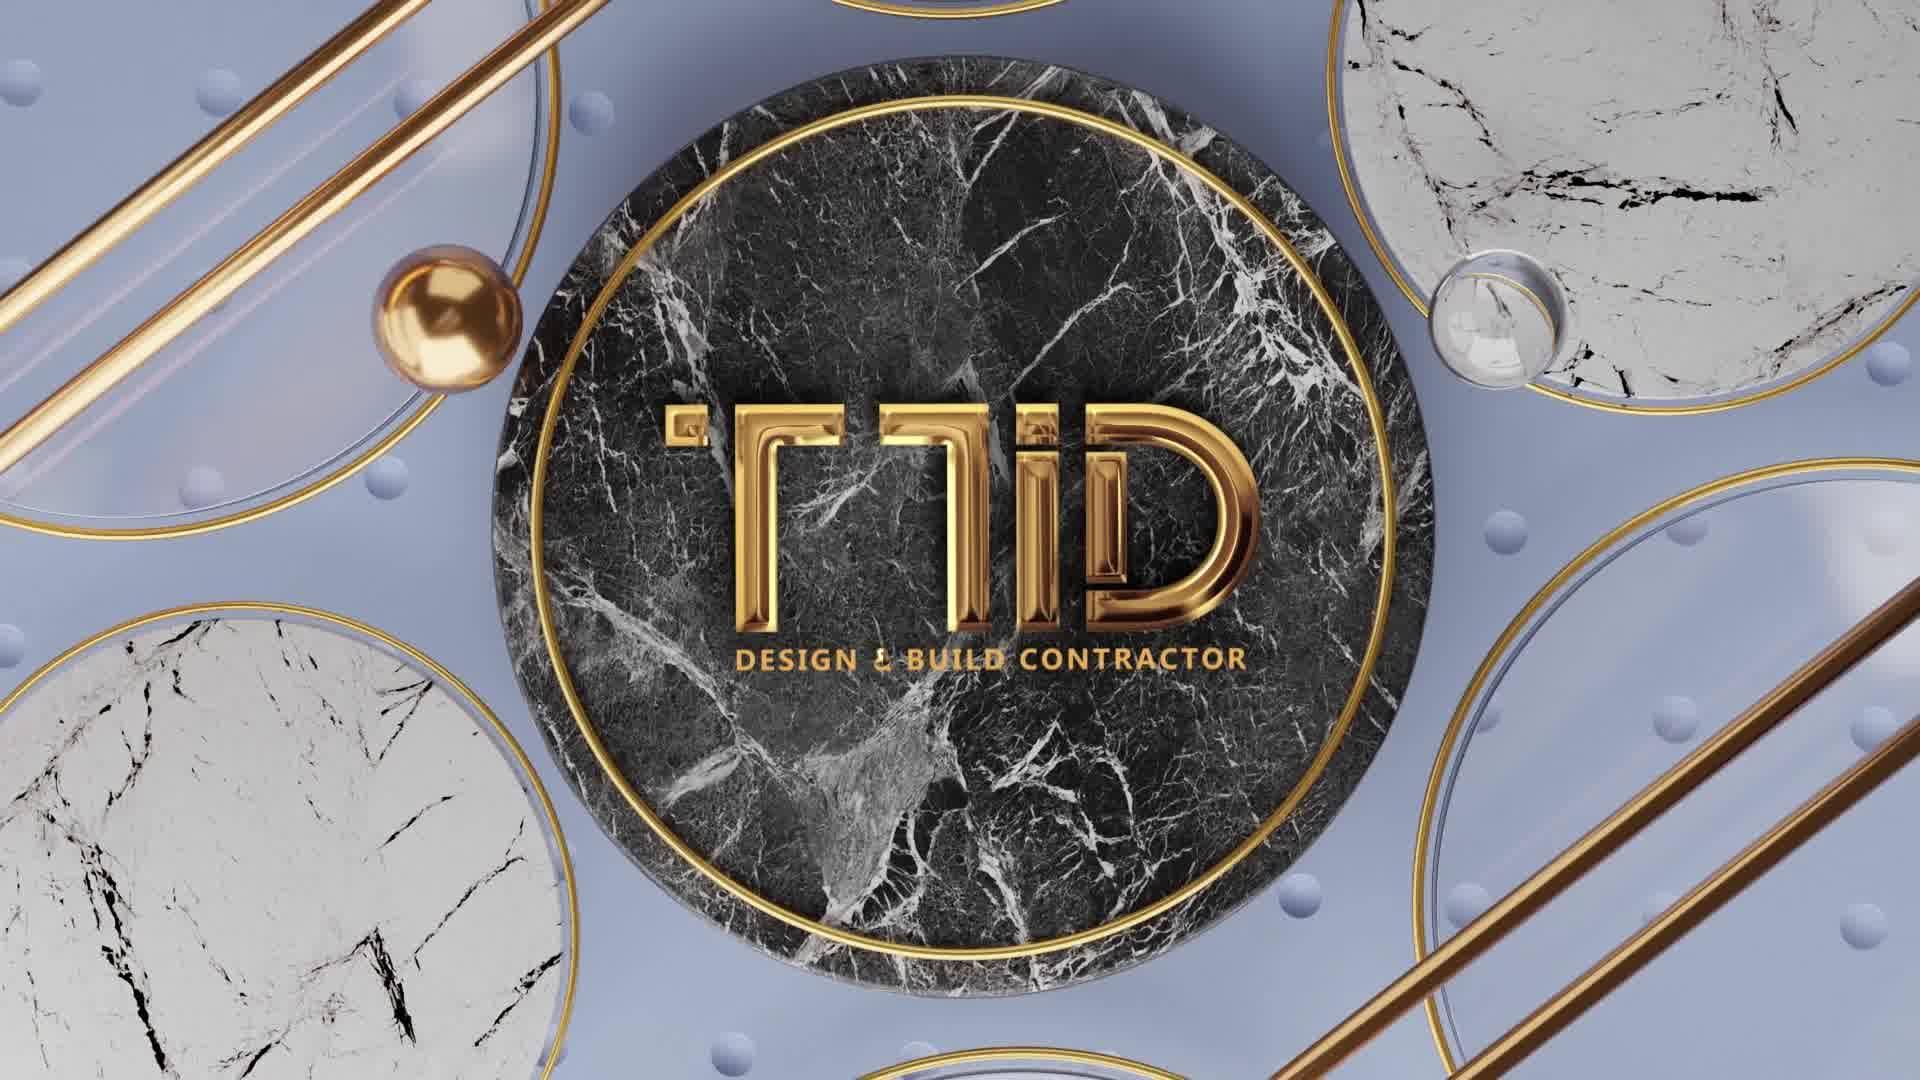 TTID DESIGN & BUILD CONTRACTOR